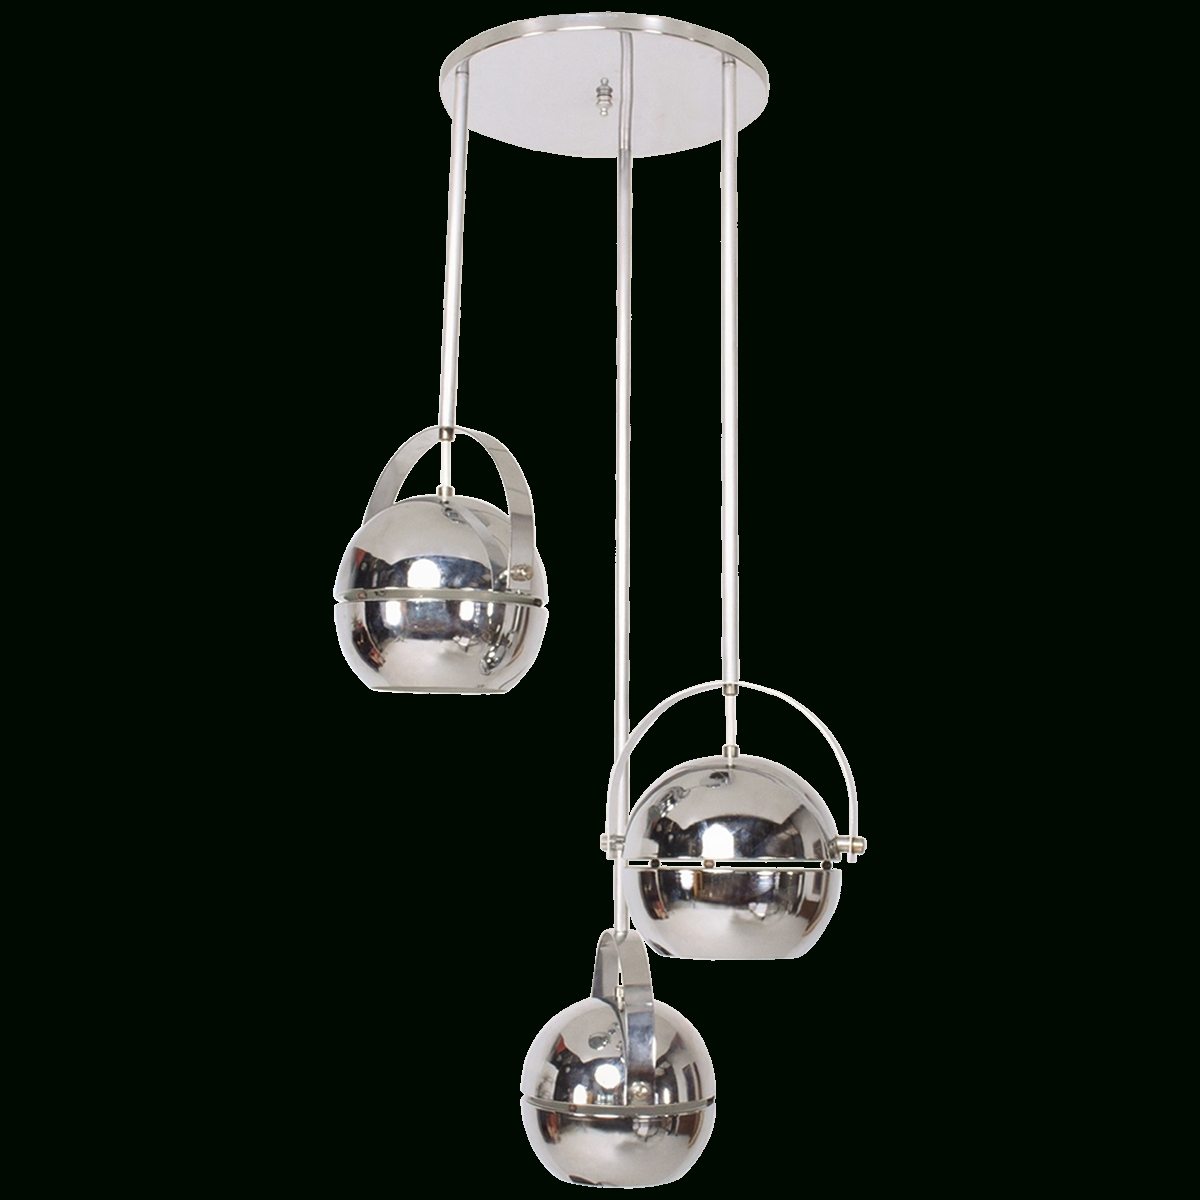 Famous Viyet – Designer Furniture – Lighting – Mid Century Modern Chrome Pertaining To Modern Chrome Chandelier (View 9 of 20)